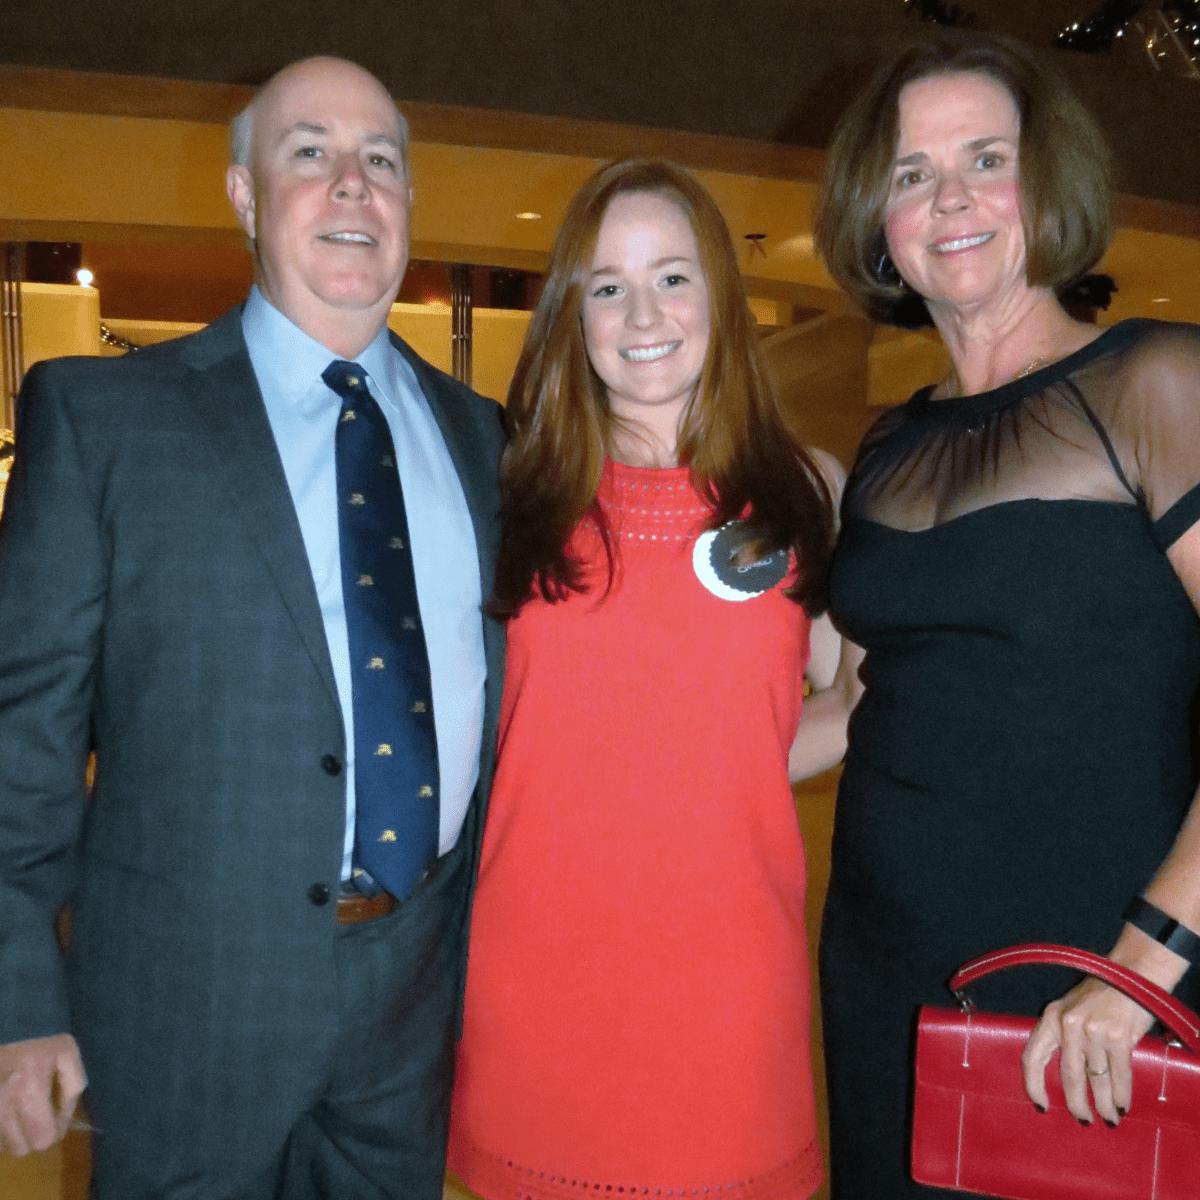 John Stone, Callie Stone, Lisa Stone